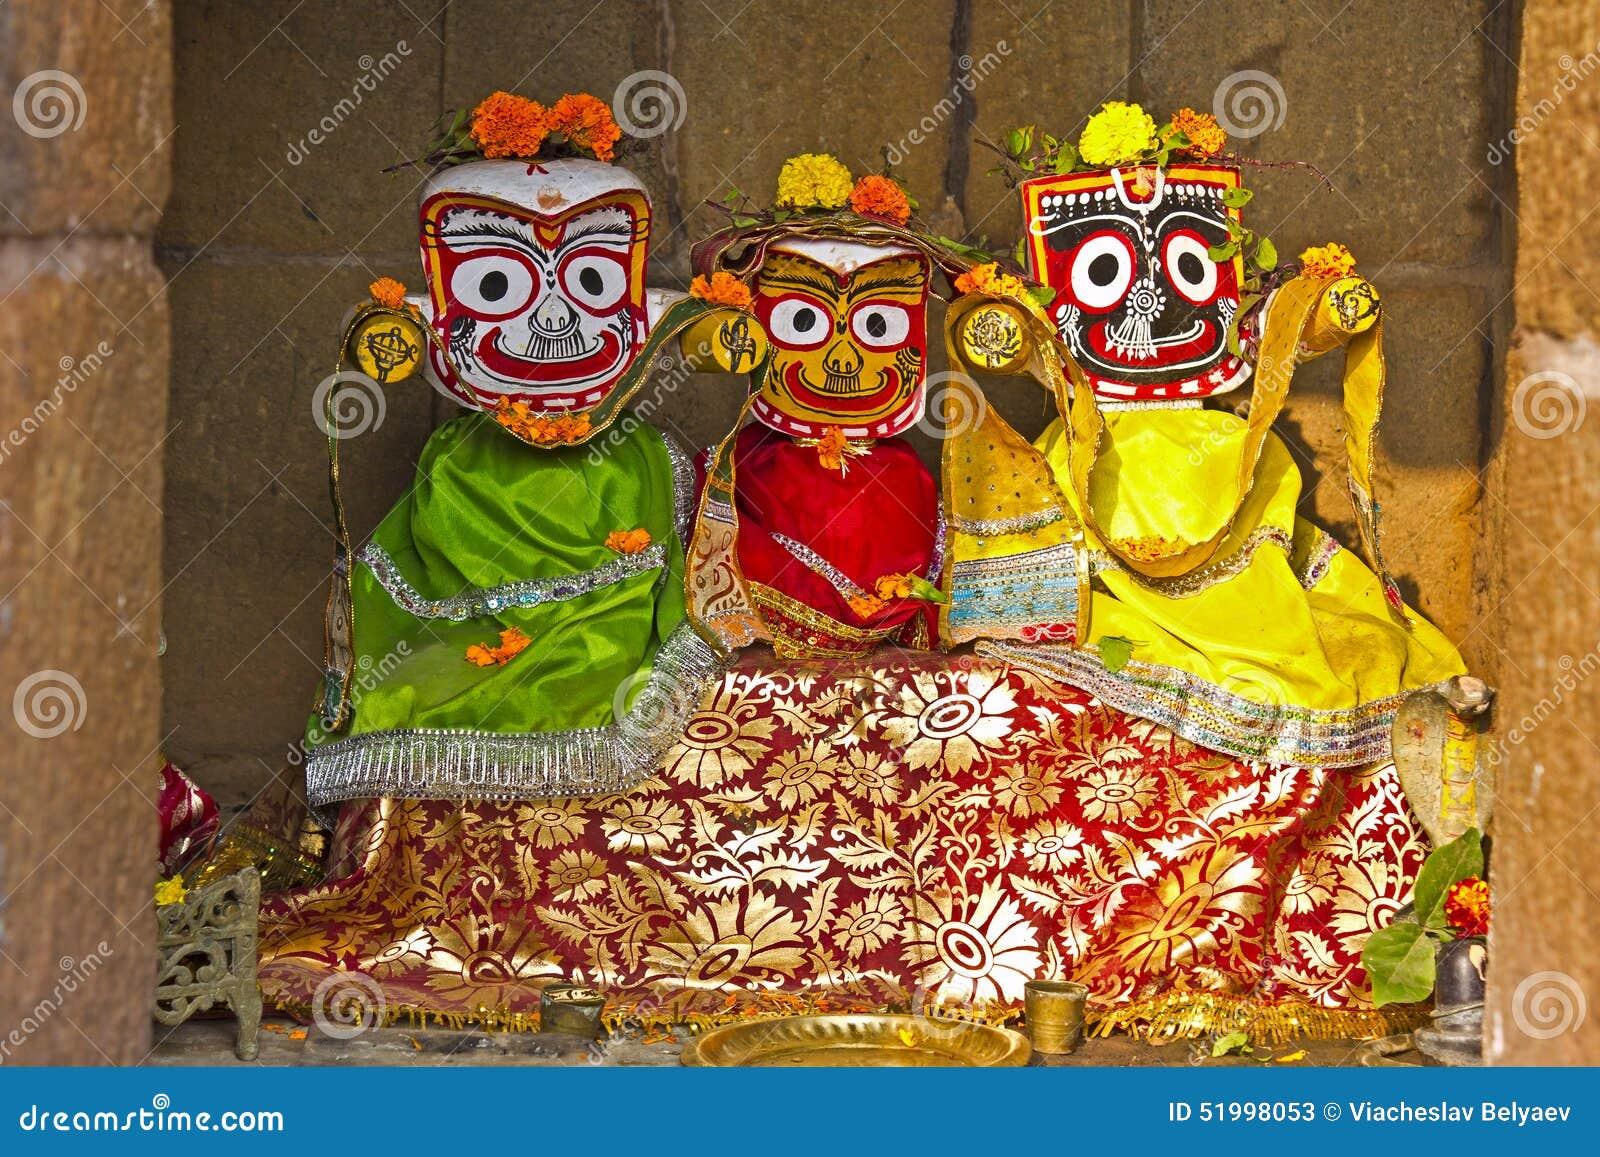 Jagannath Baladev Subhadra Stock Images - Download 27